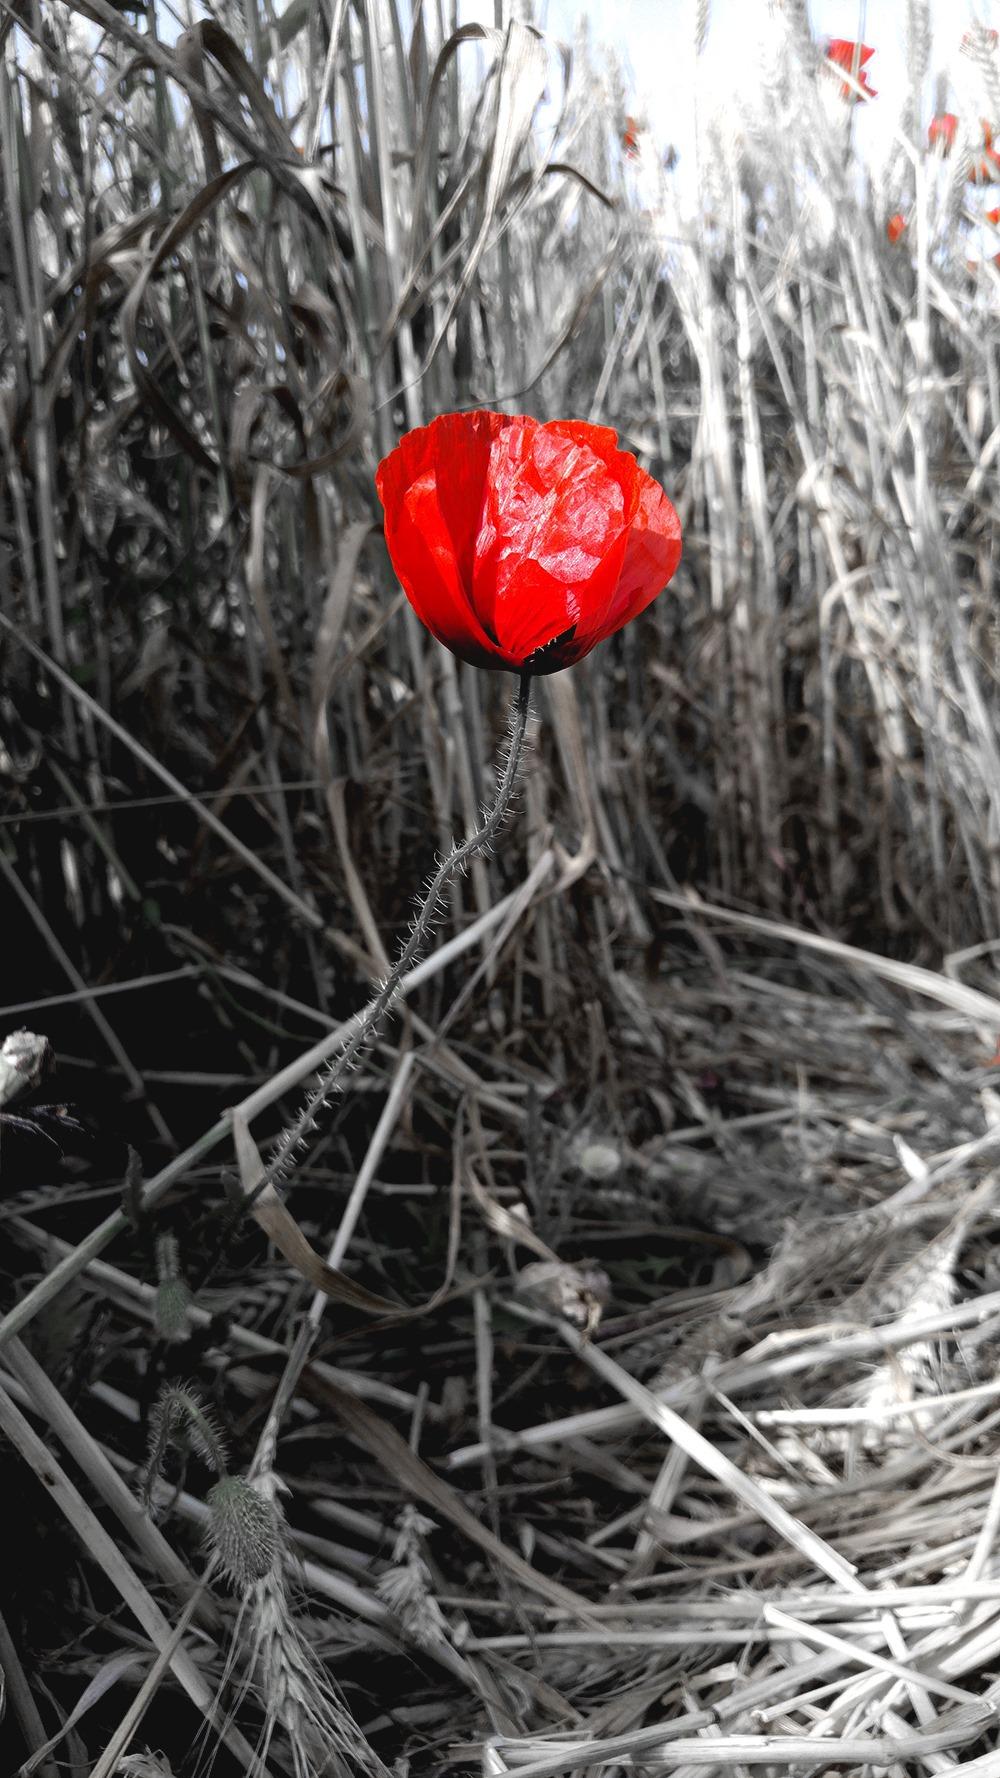 Mallorca-Mohnfeld-Natur-Menschen-Ferne-Blume-Einzeln